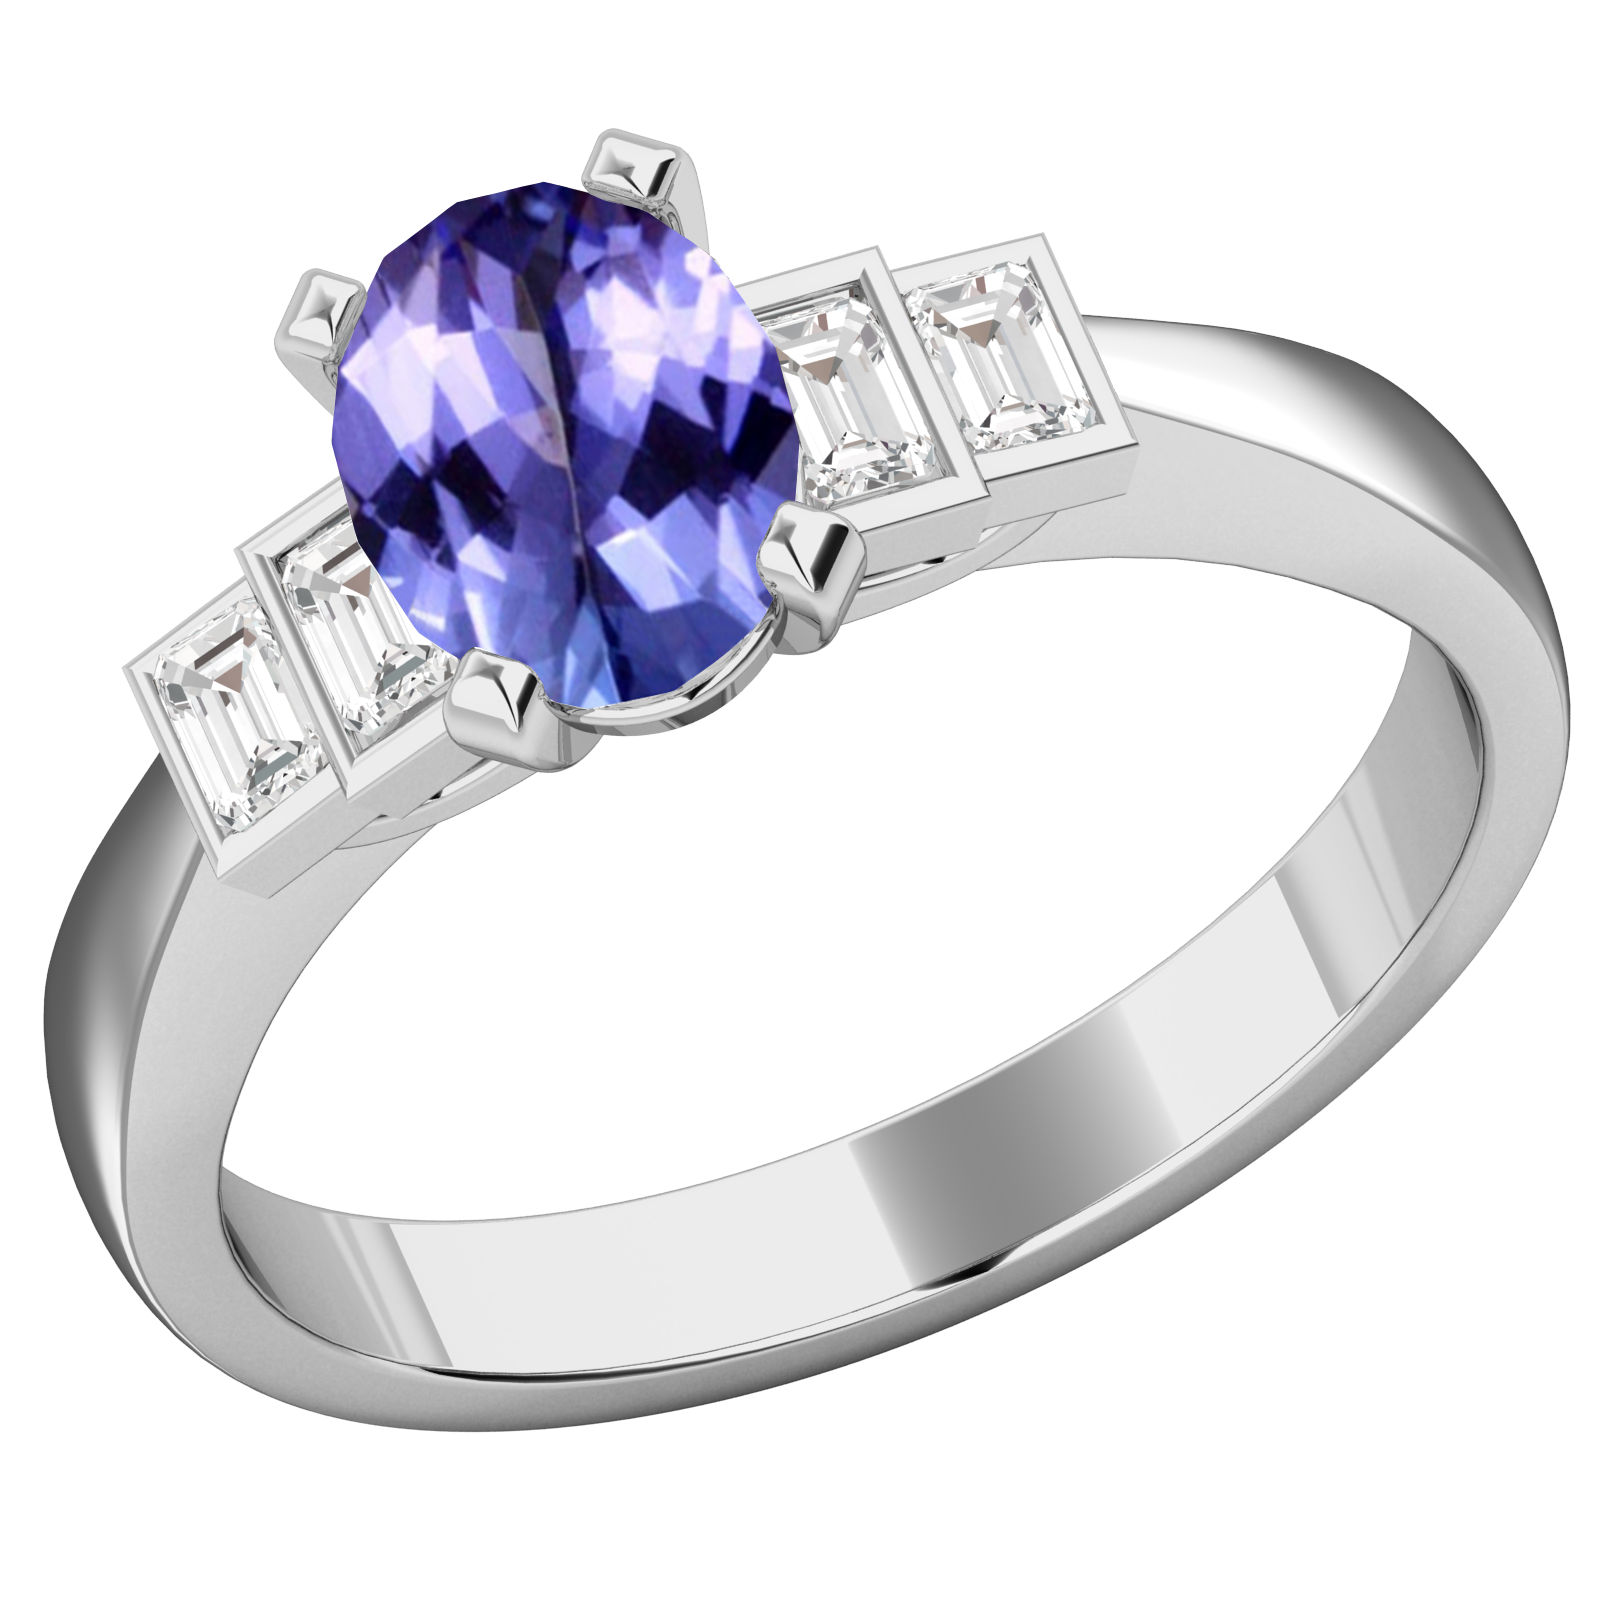 RDT718W-Inel cu Tanzanite si Diamante Dama Aur Alb 18kt cu 4 Diamante, cu un Tanzanite Central Oval si Diamante Forma Bagheta pe Margini-img1